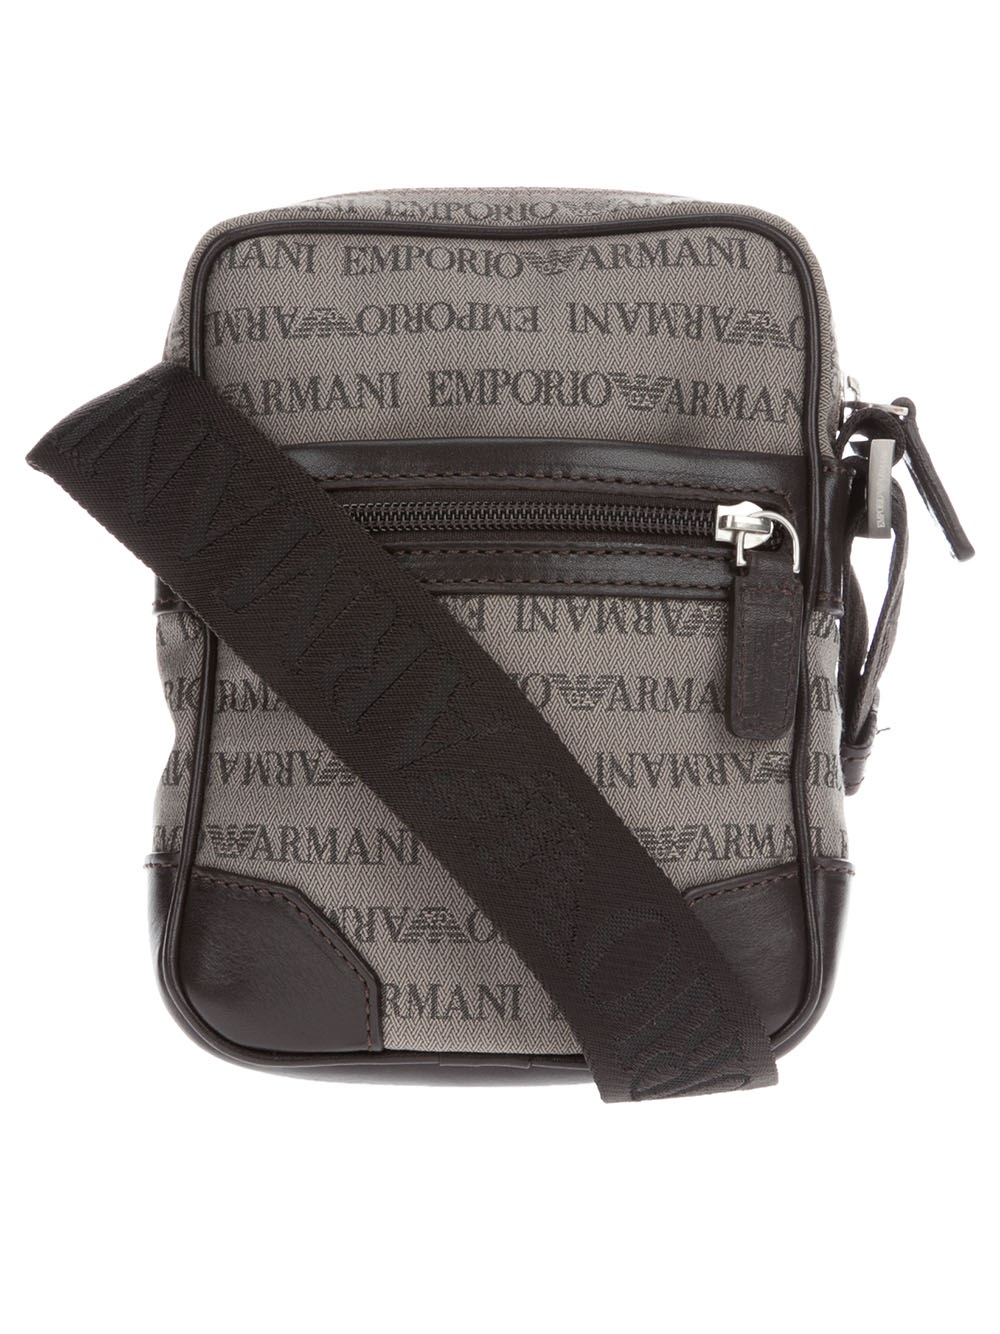 0c71db663256 Emporio Armani Messenger Bag in Black for Men - Lyst